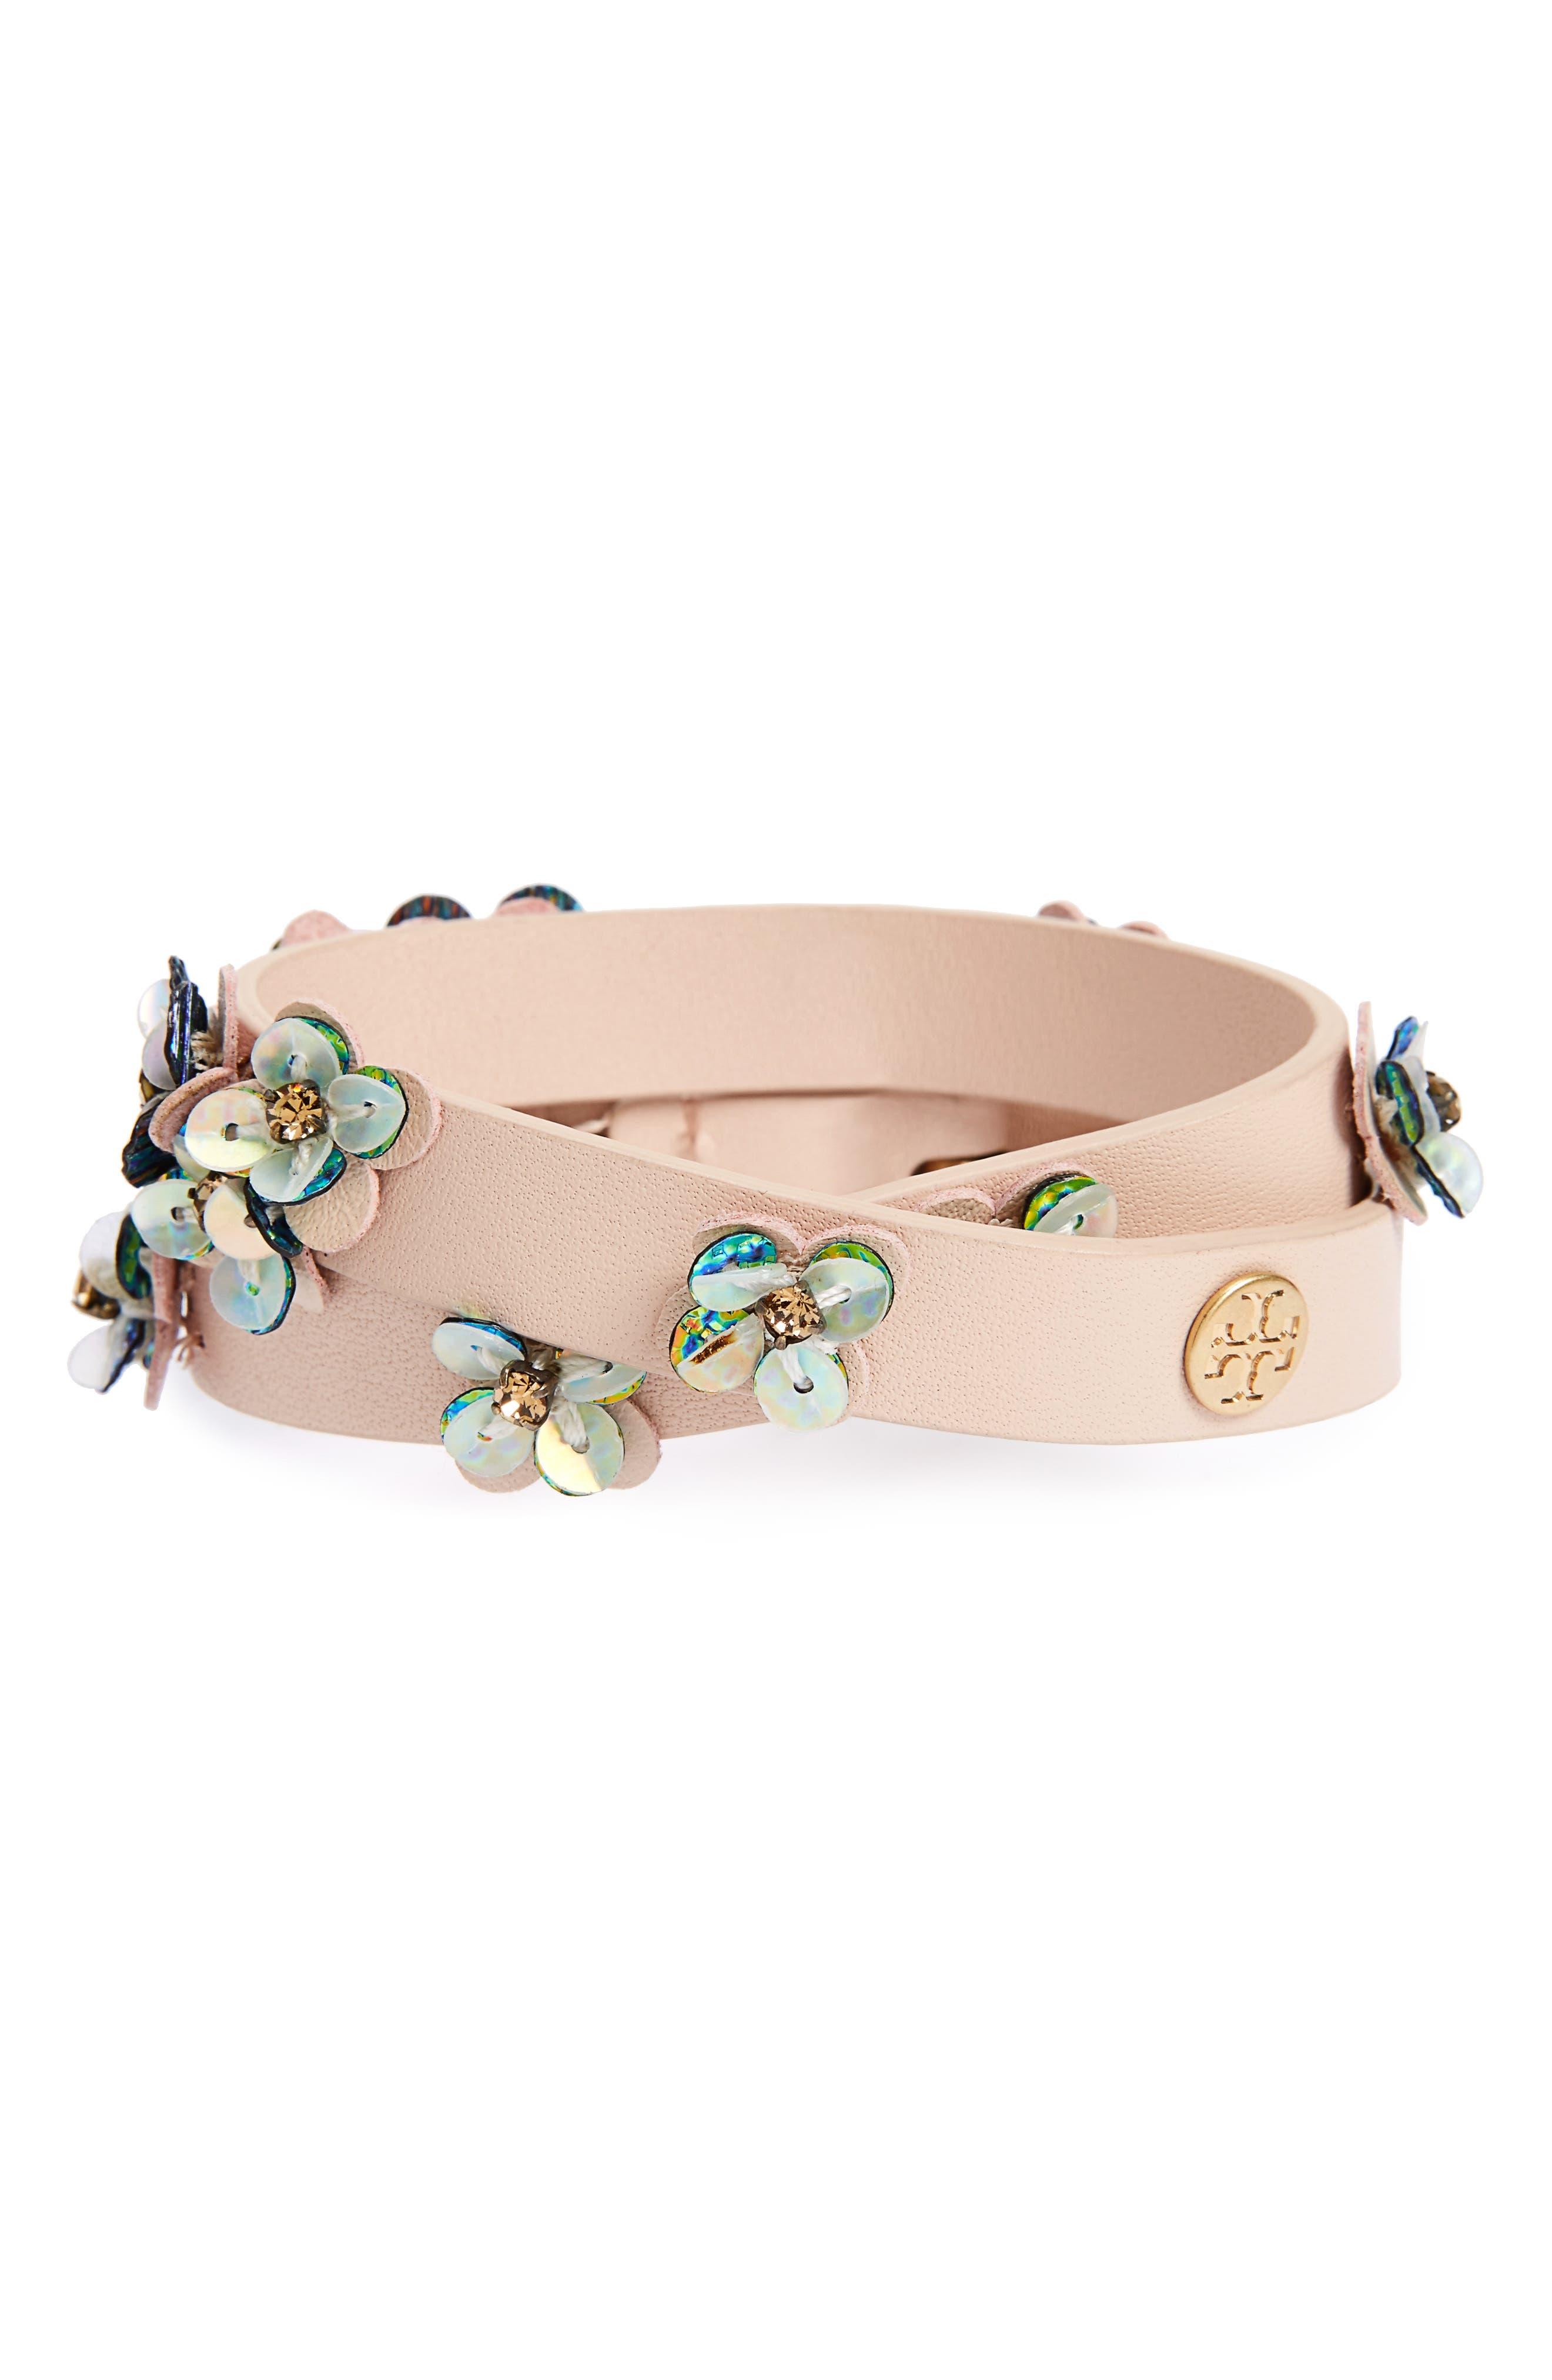 Leather Wrap Bracelet,                         Main,                         color, Light Oak / Vintage Gold